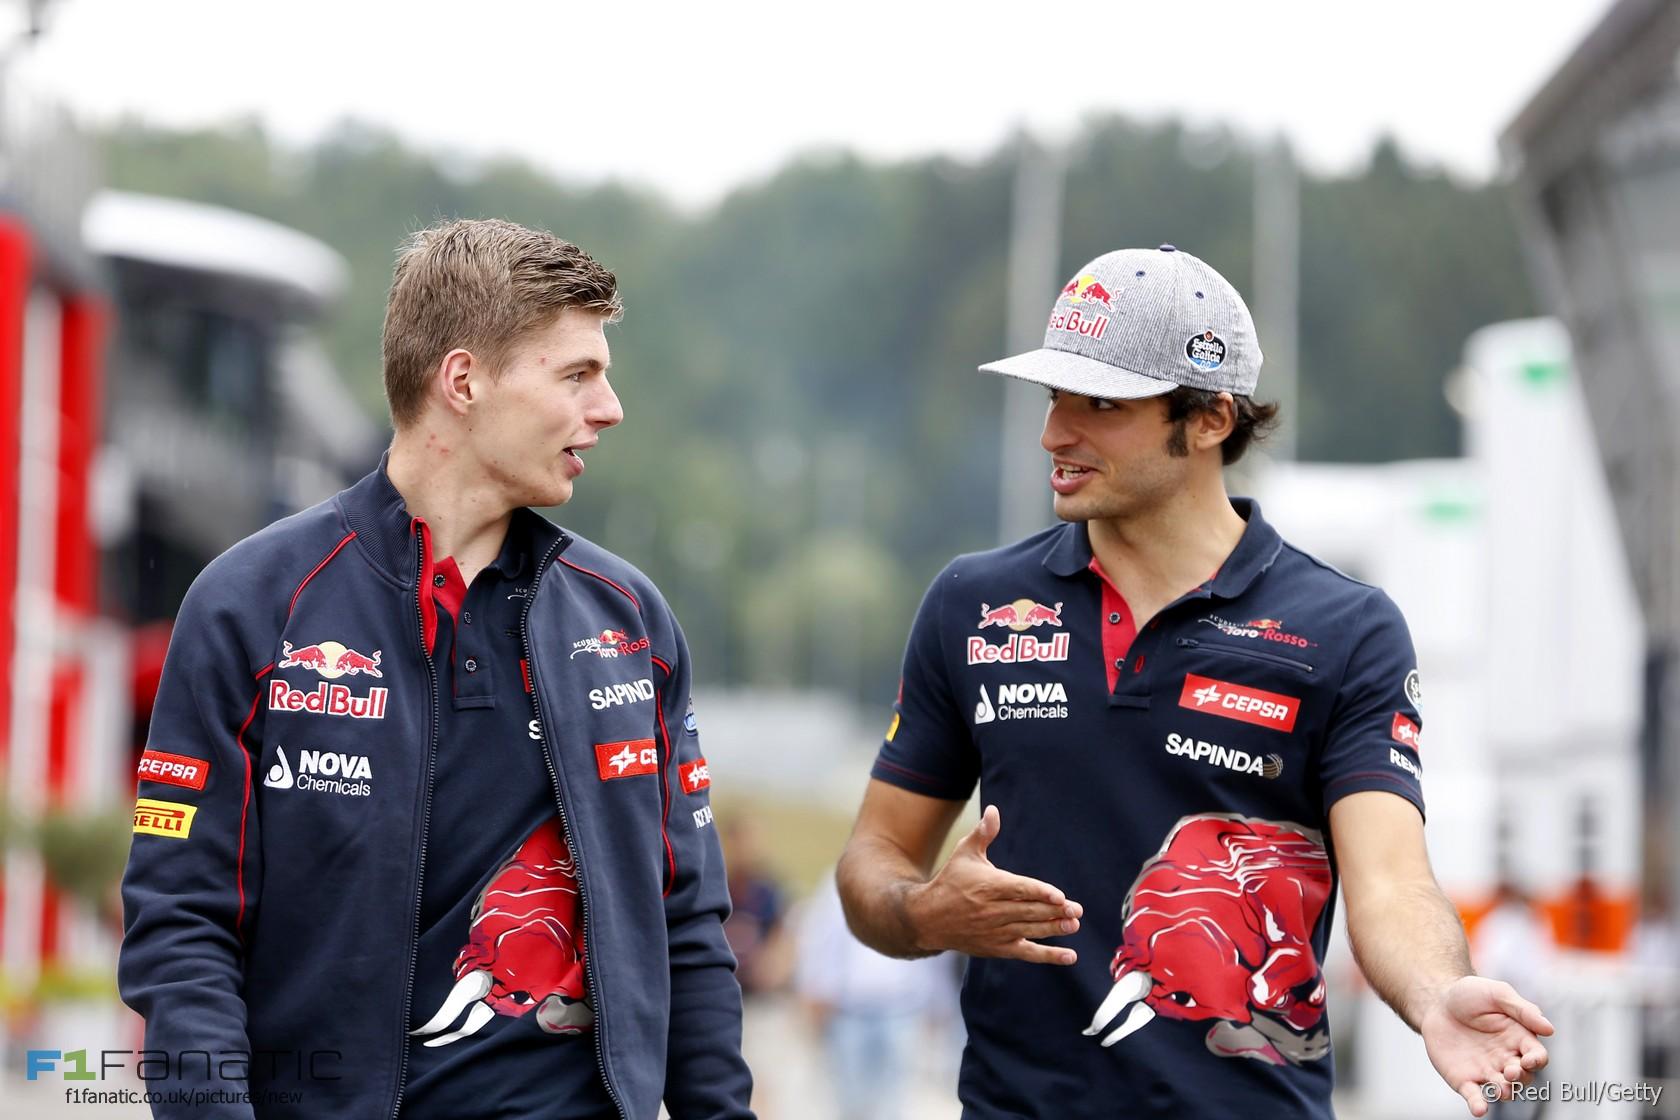 Max Verstappen, Carlos Sainz Jnr, Toro Rosso, Red Bull Ring, 2015